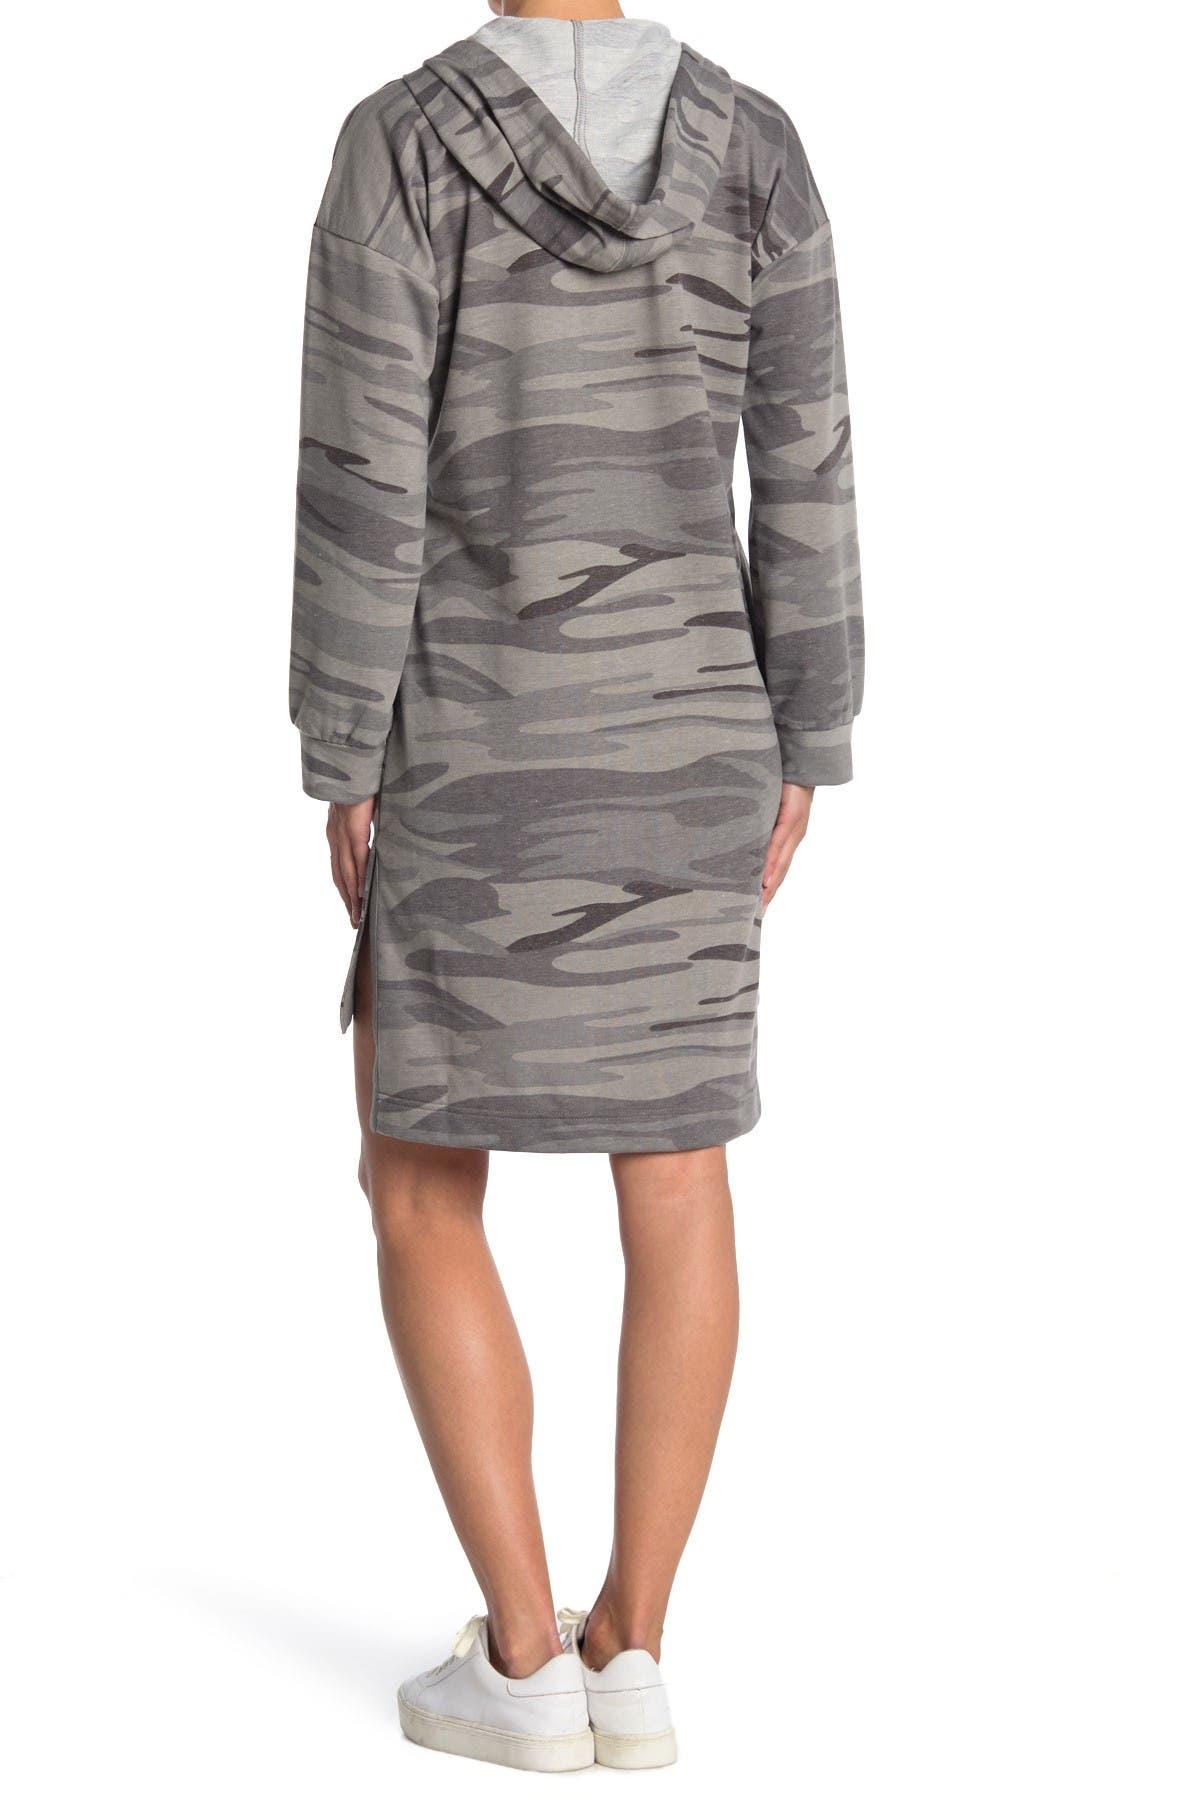 Melloday Hooded Sweater Dress In Open Grey12